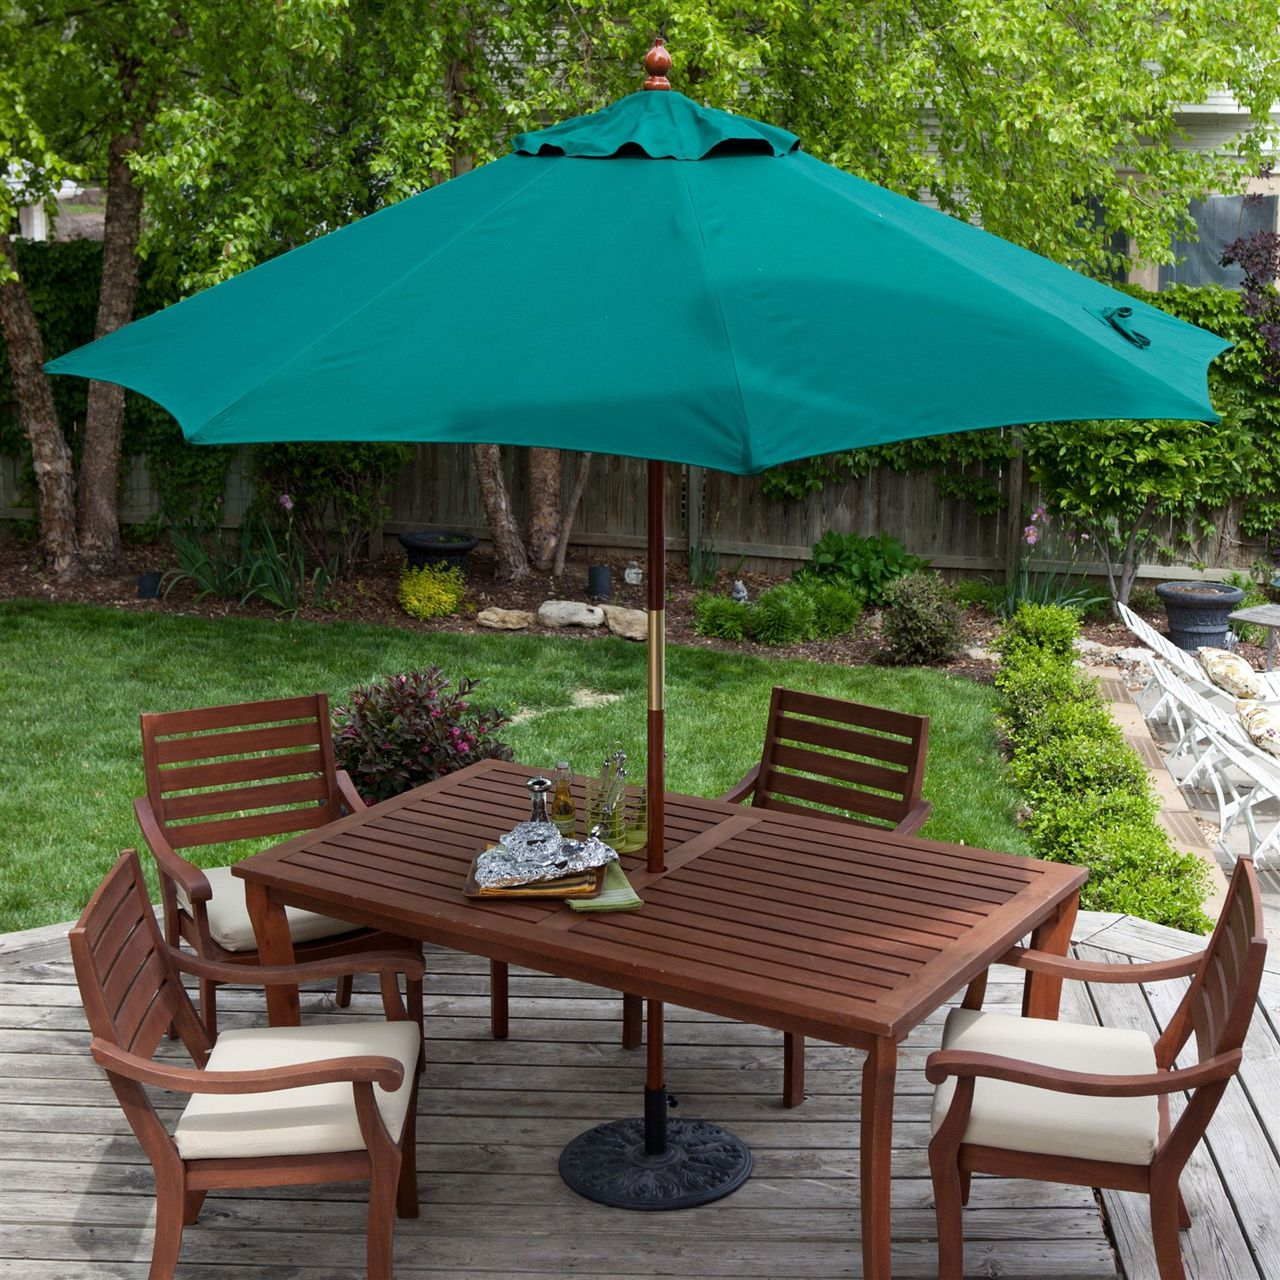 Commercial Grade 9 Ft Patio Umbrella Forest Green Sunbrella